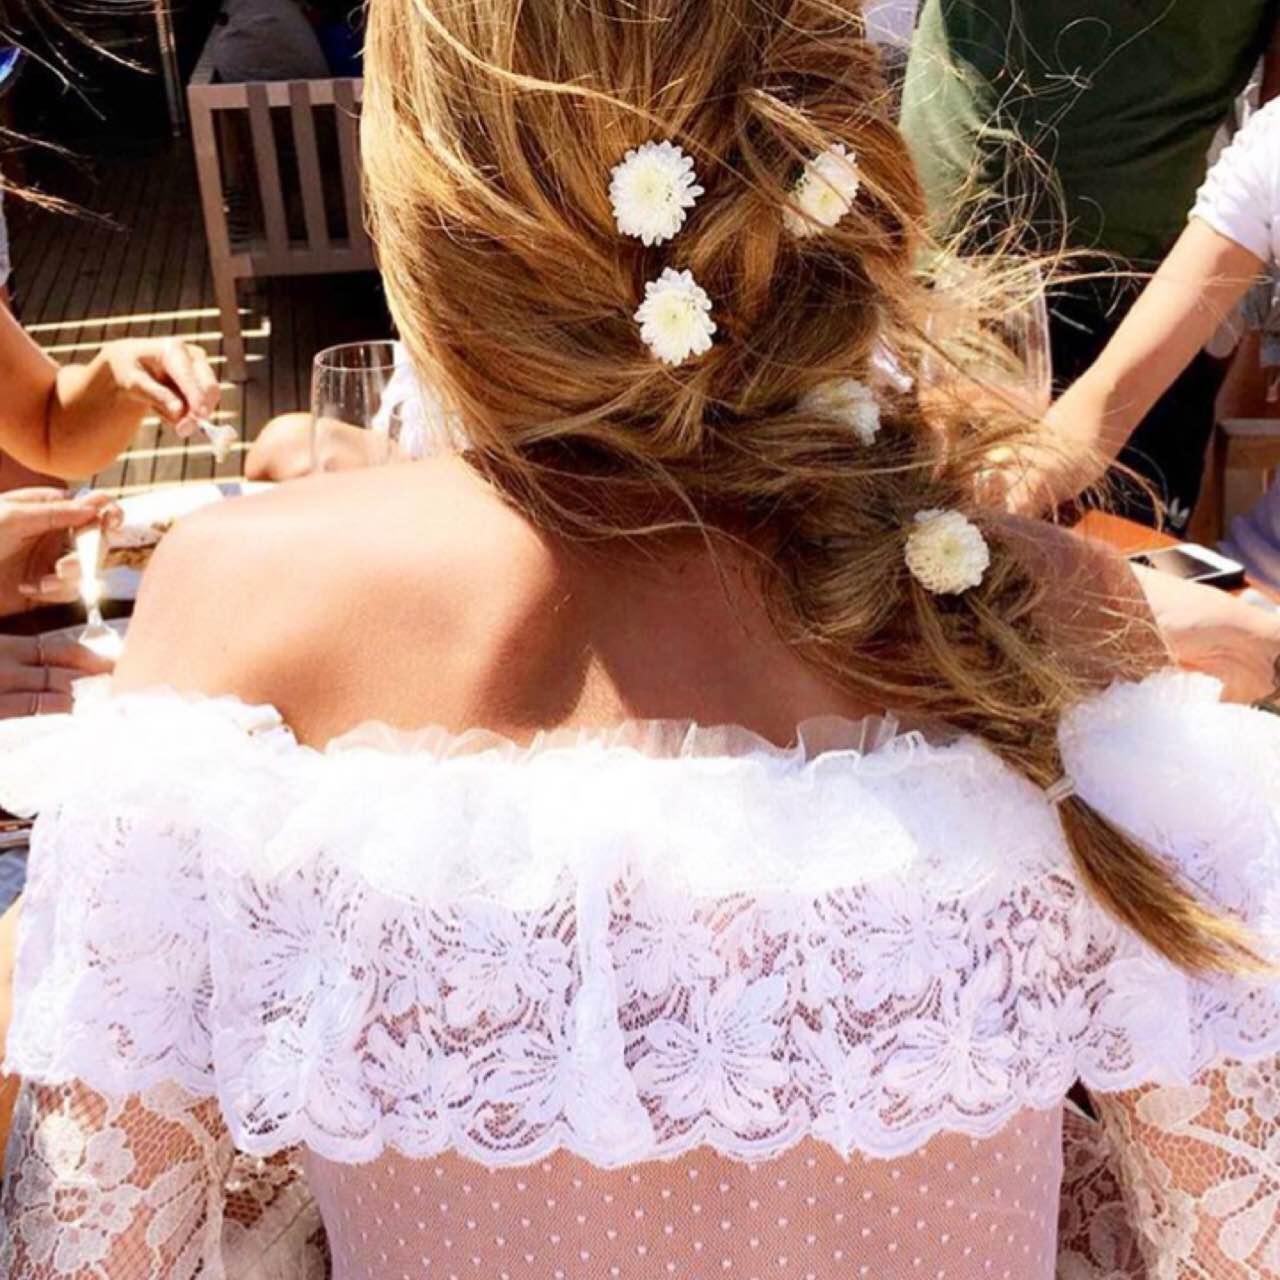 Ana-Beatriz-Barros-pre-wedding-dress